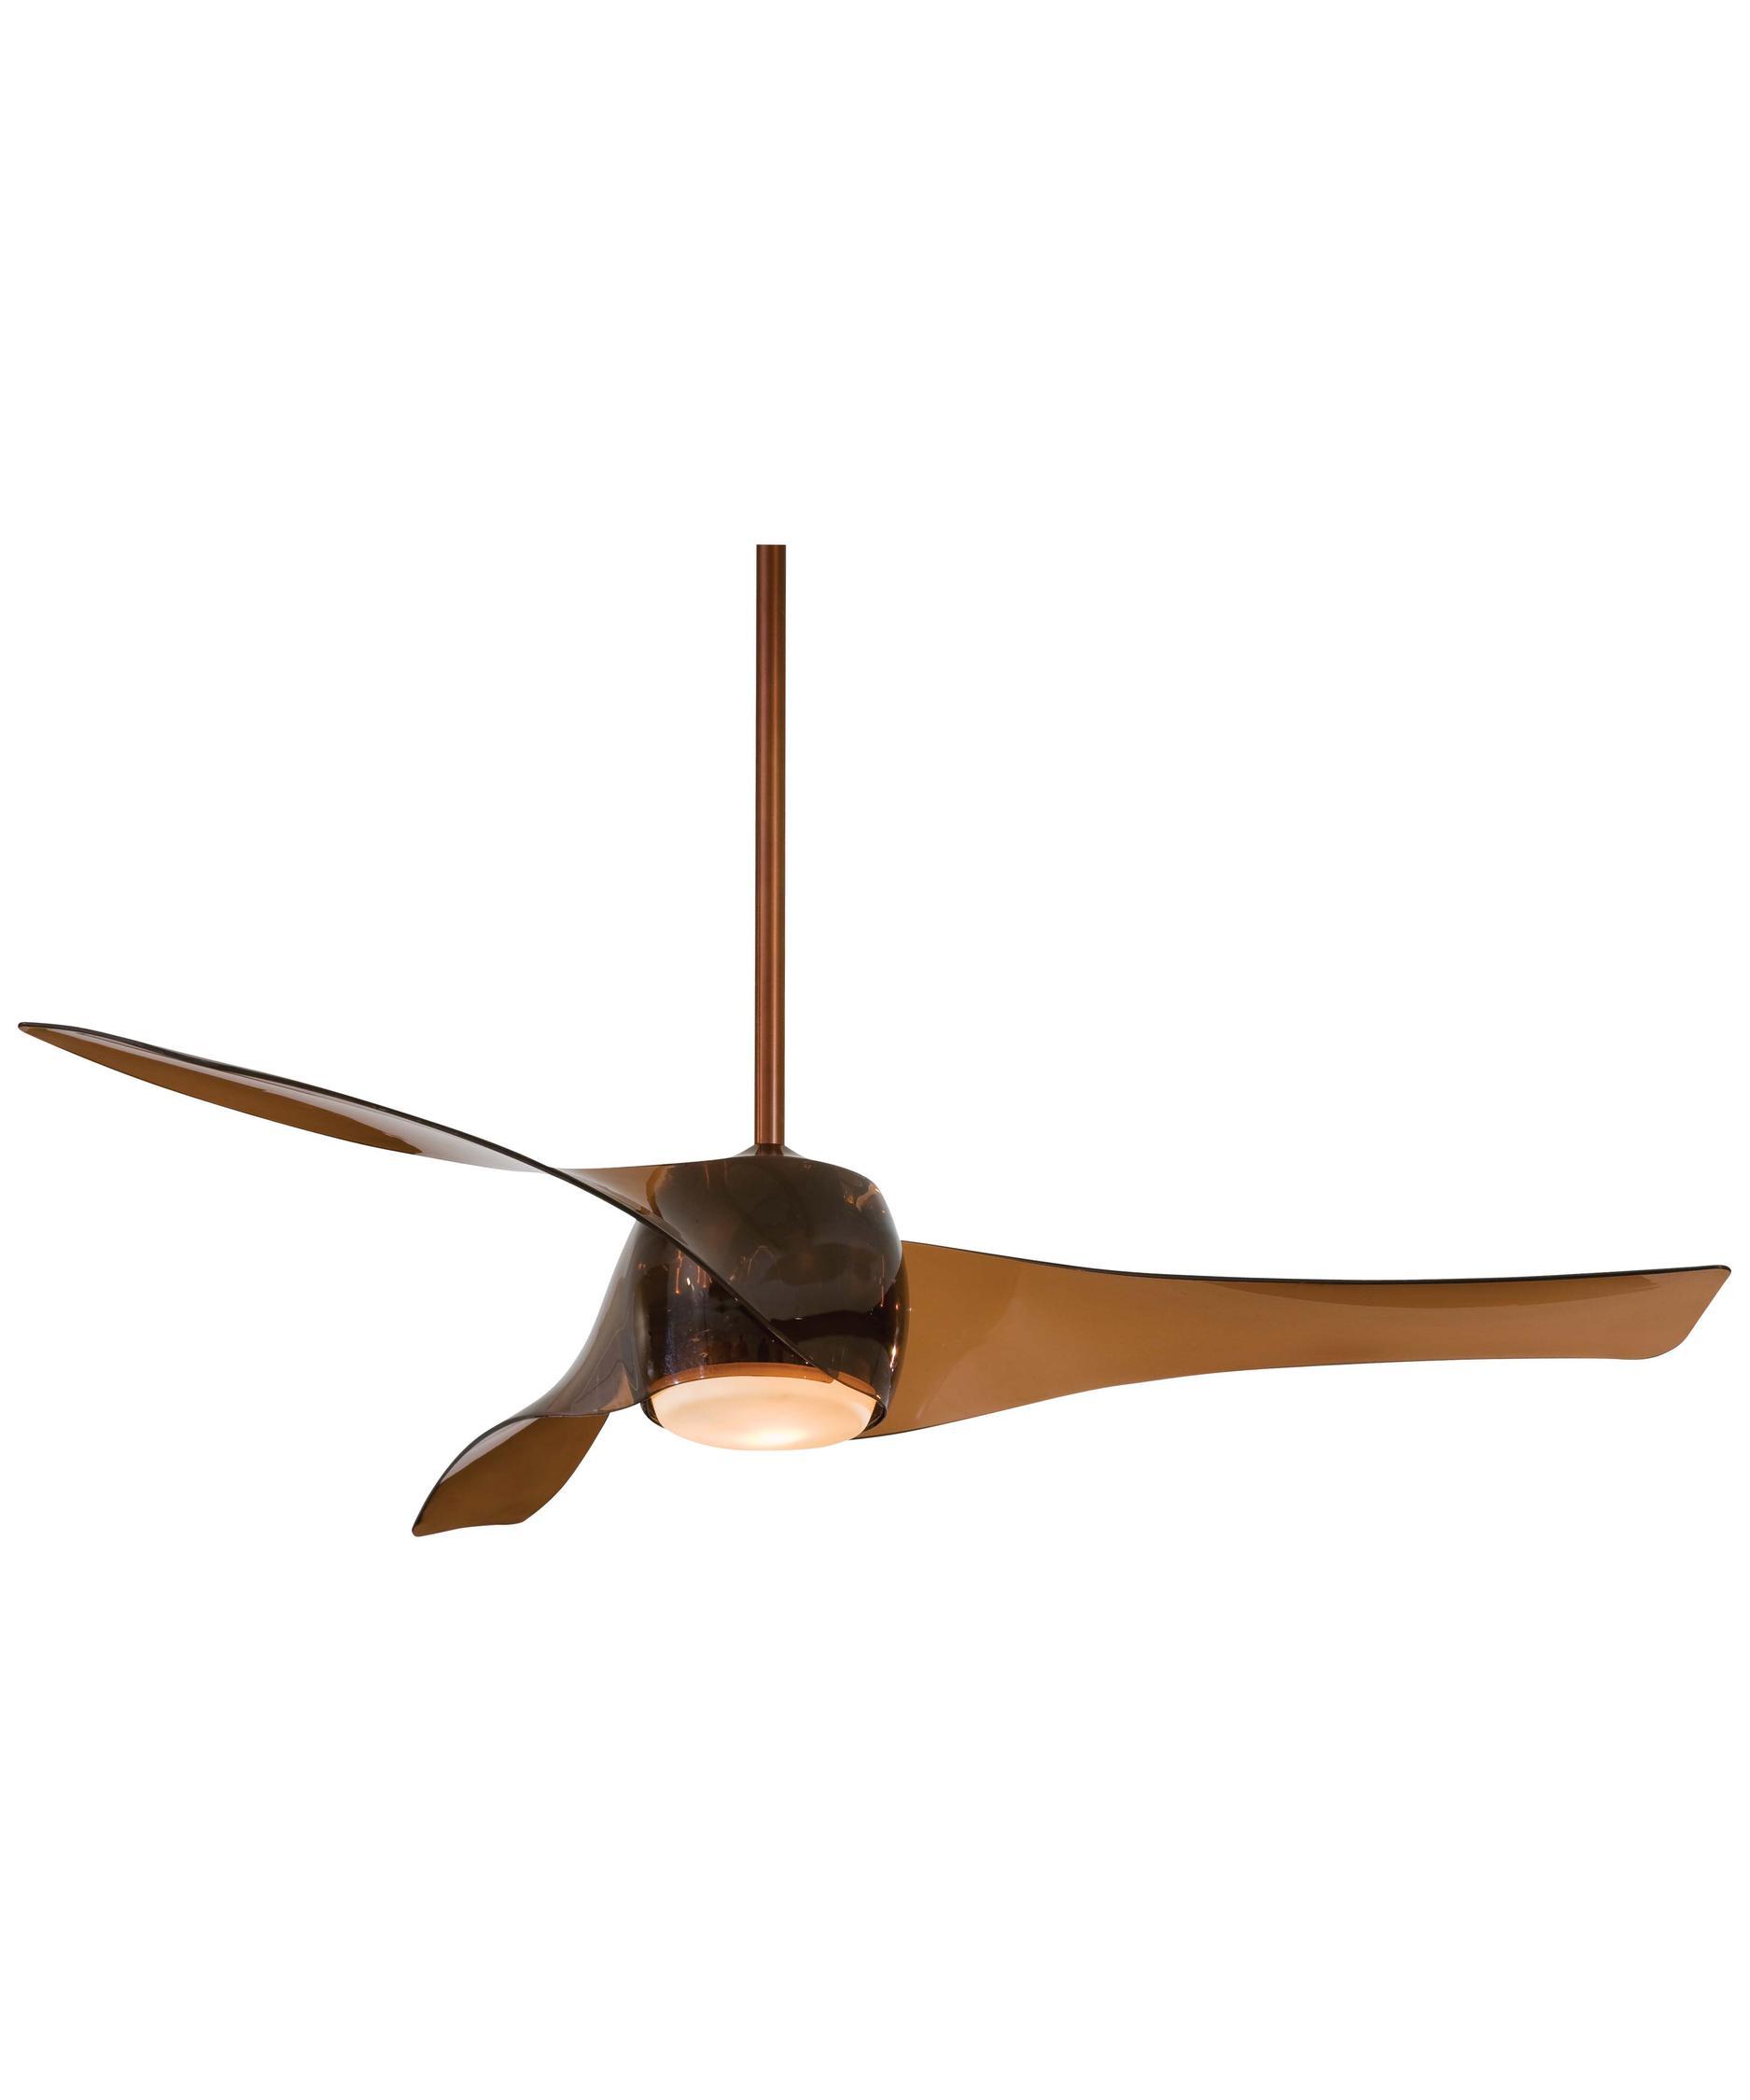 minka aire f artemis  inch  blade ceiling fan  capitol  - minka aire f artemis  inch  blade ceiling fan  capitol lightinglightingcom